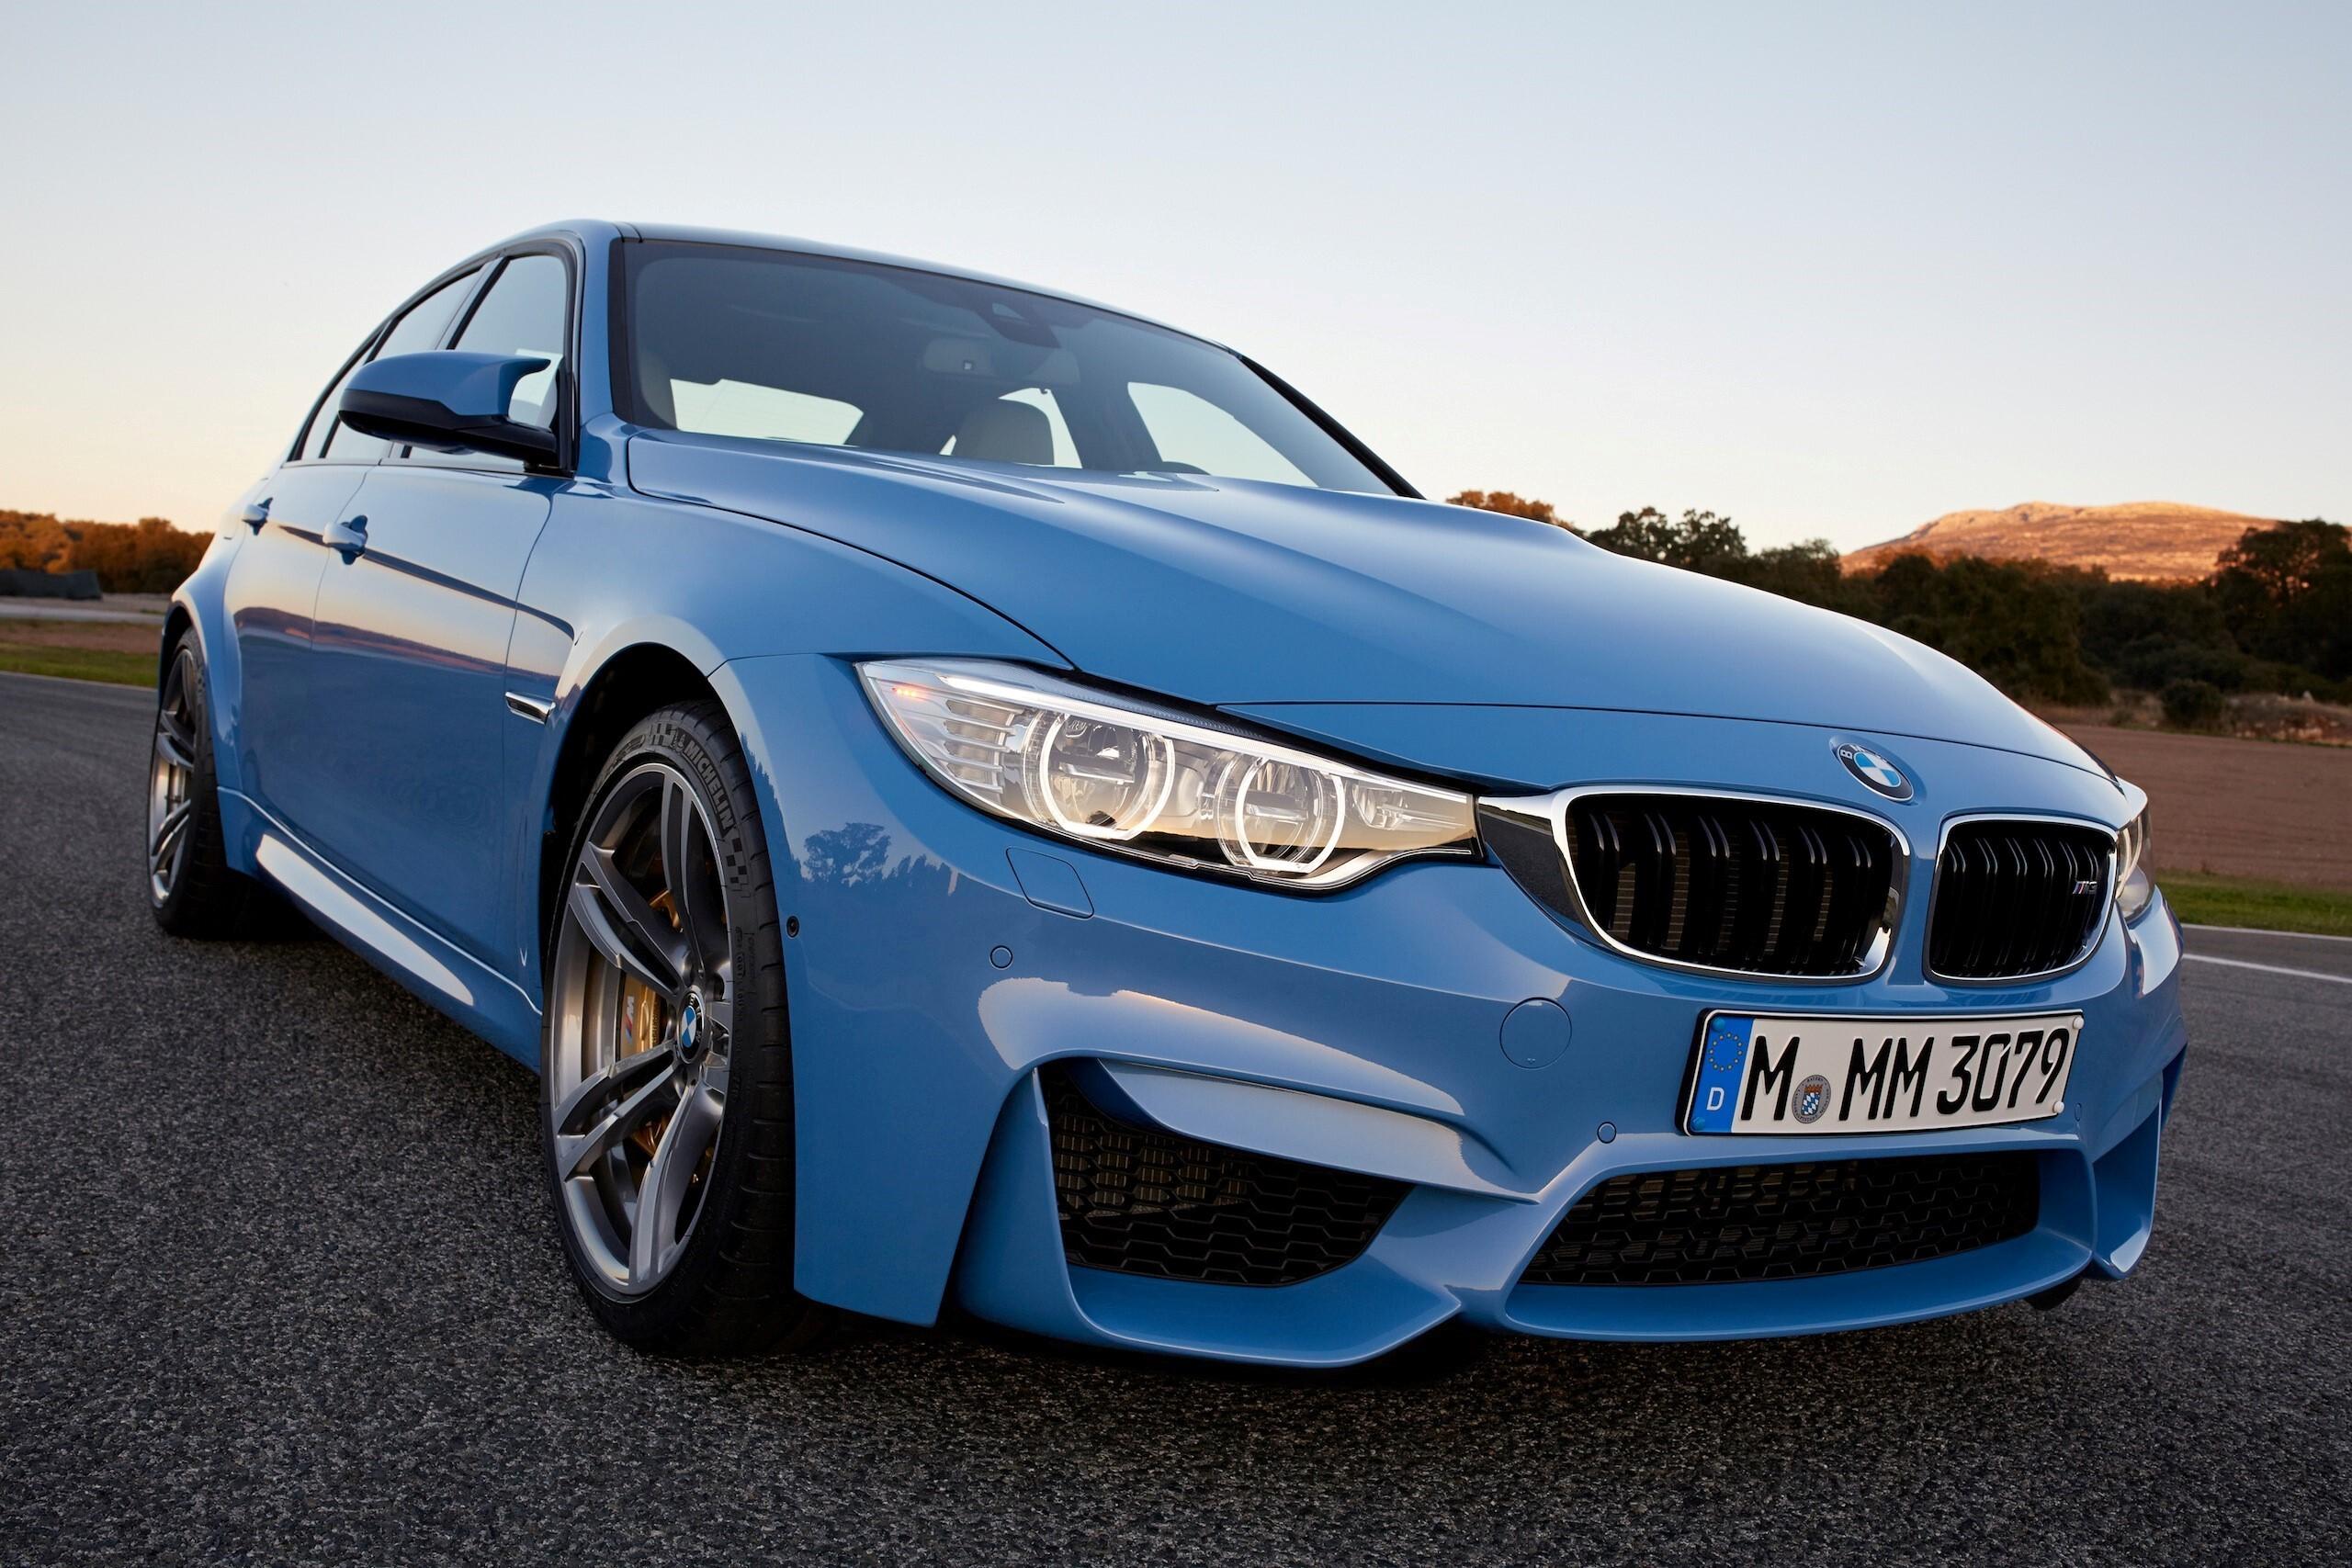 New Blue Bmw M3 High Racing Car Wallpaper Hd Wallpapers